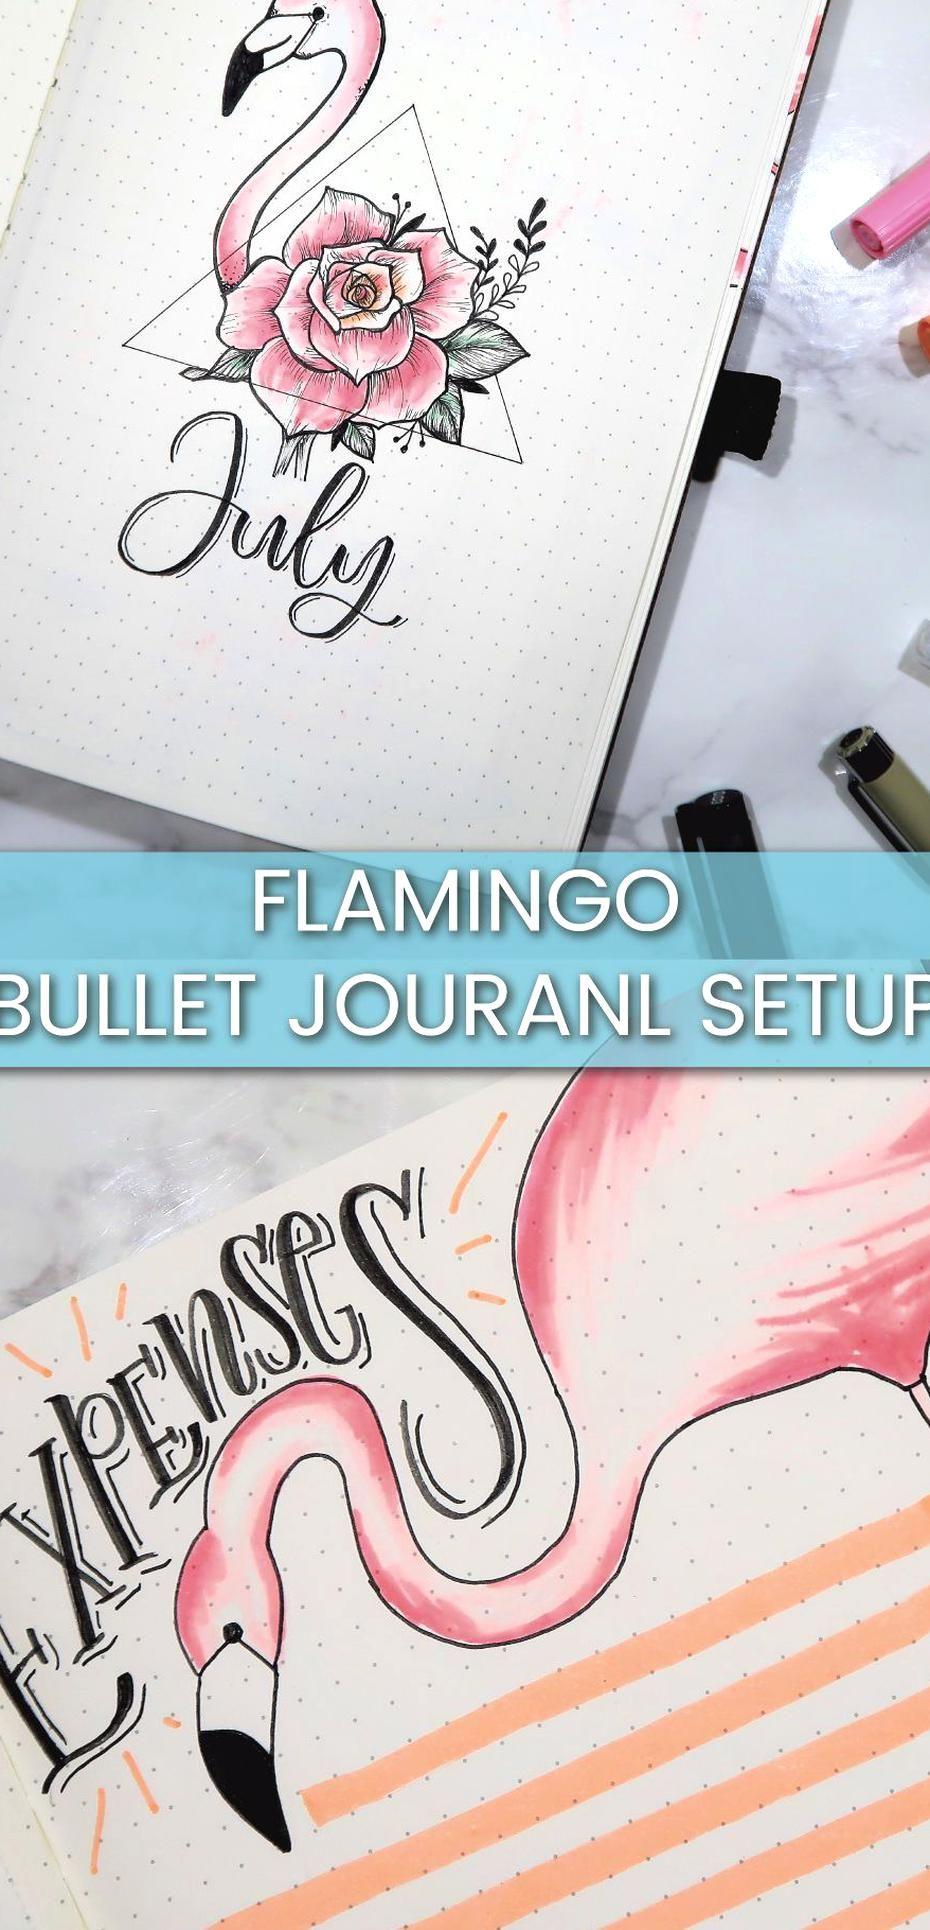 AMAZING flamingo bullet journal setup! #flamingo #bullet journal